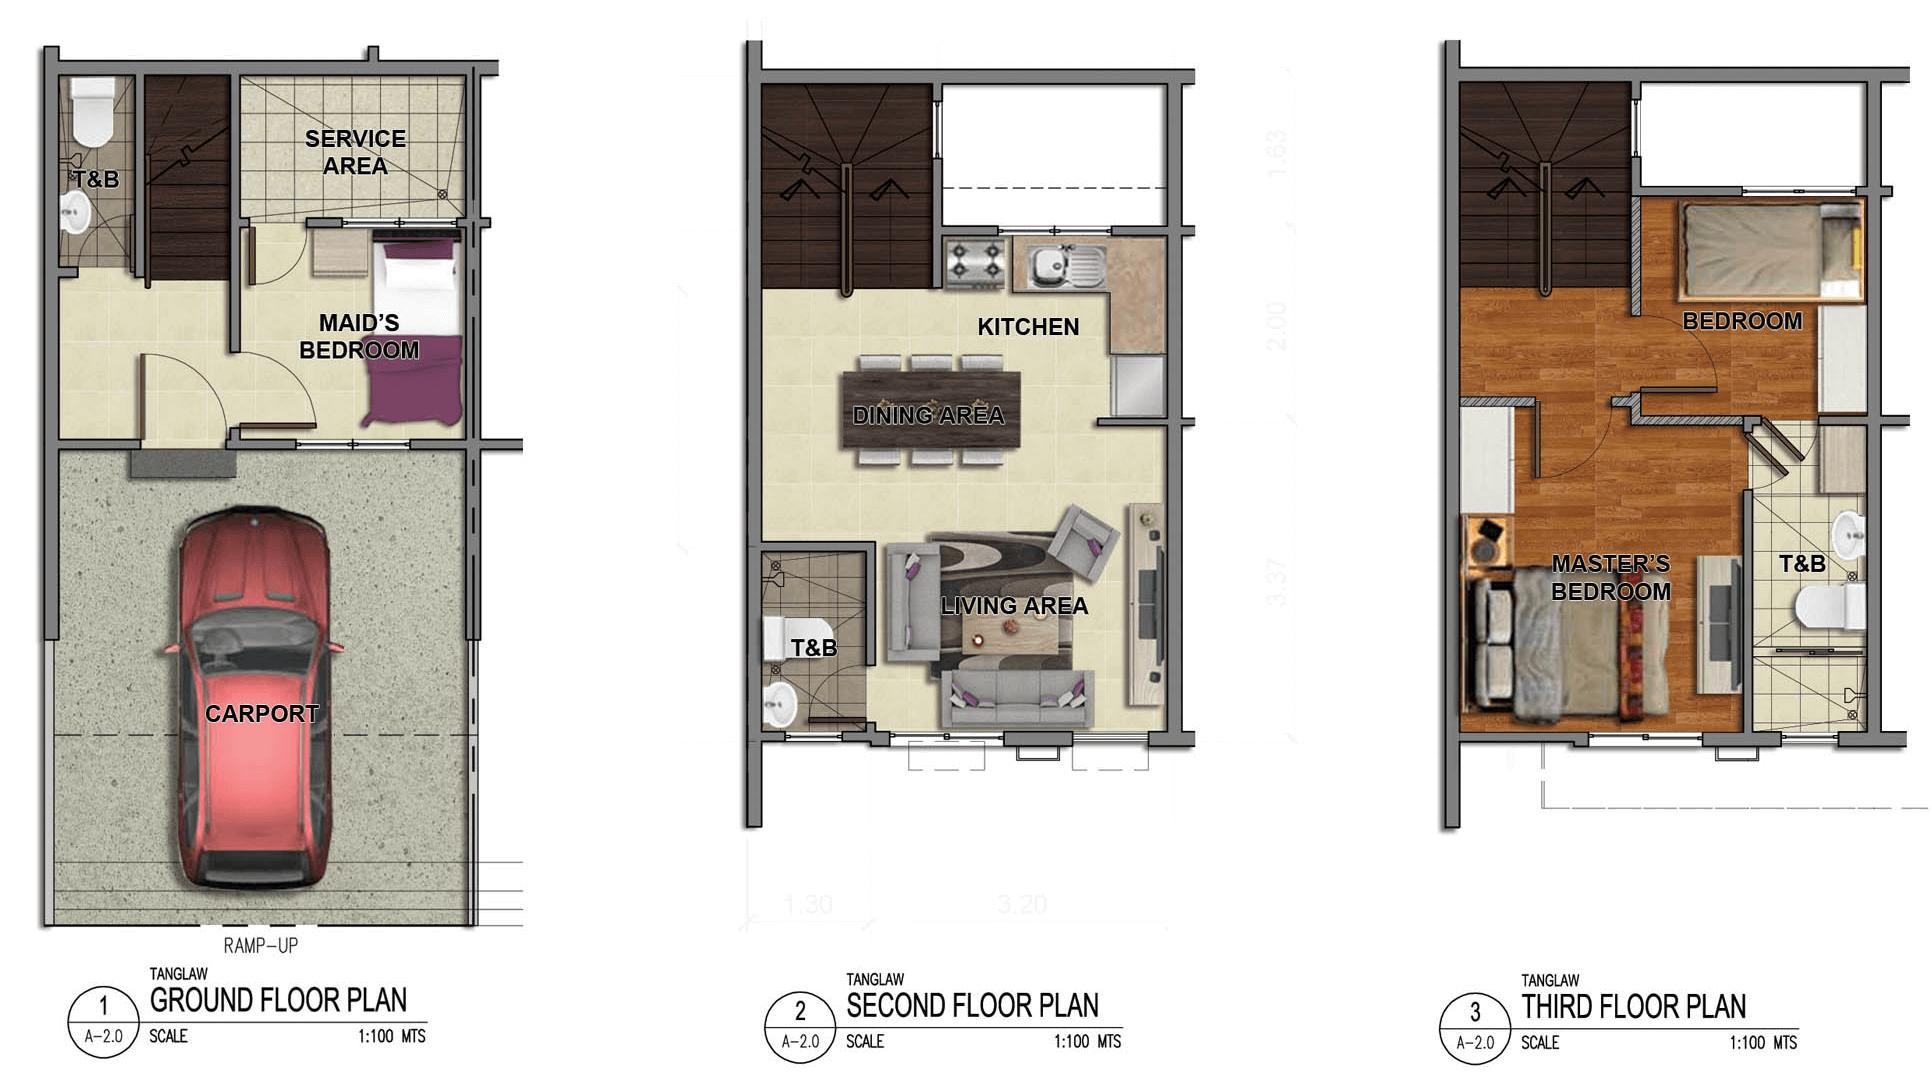 Tanglaw Residences Floor Plan